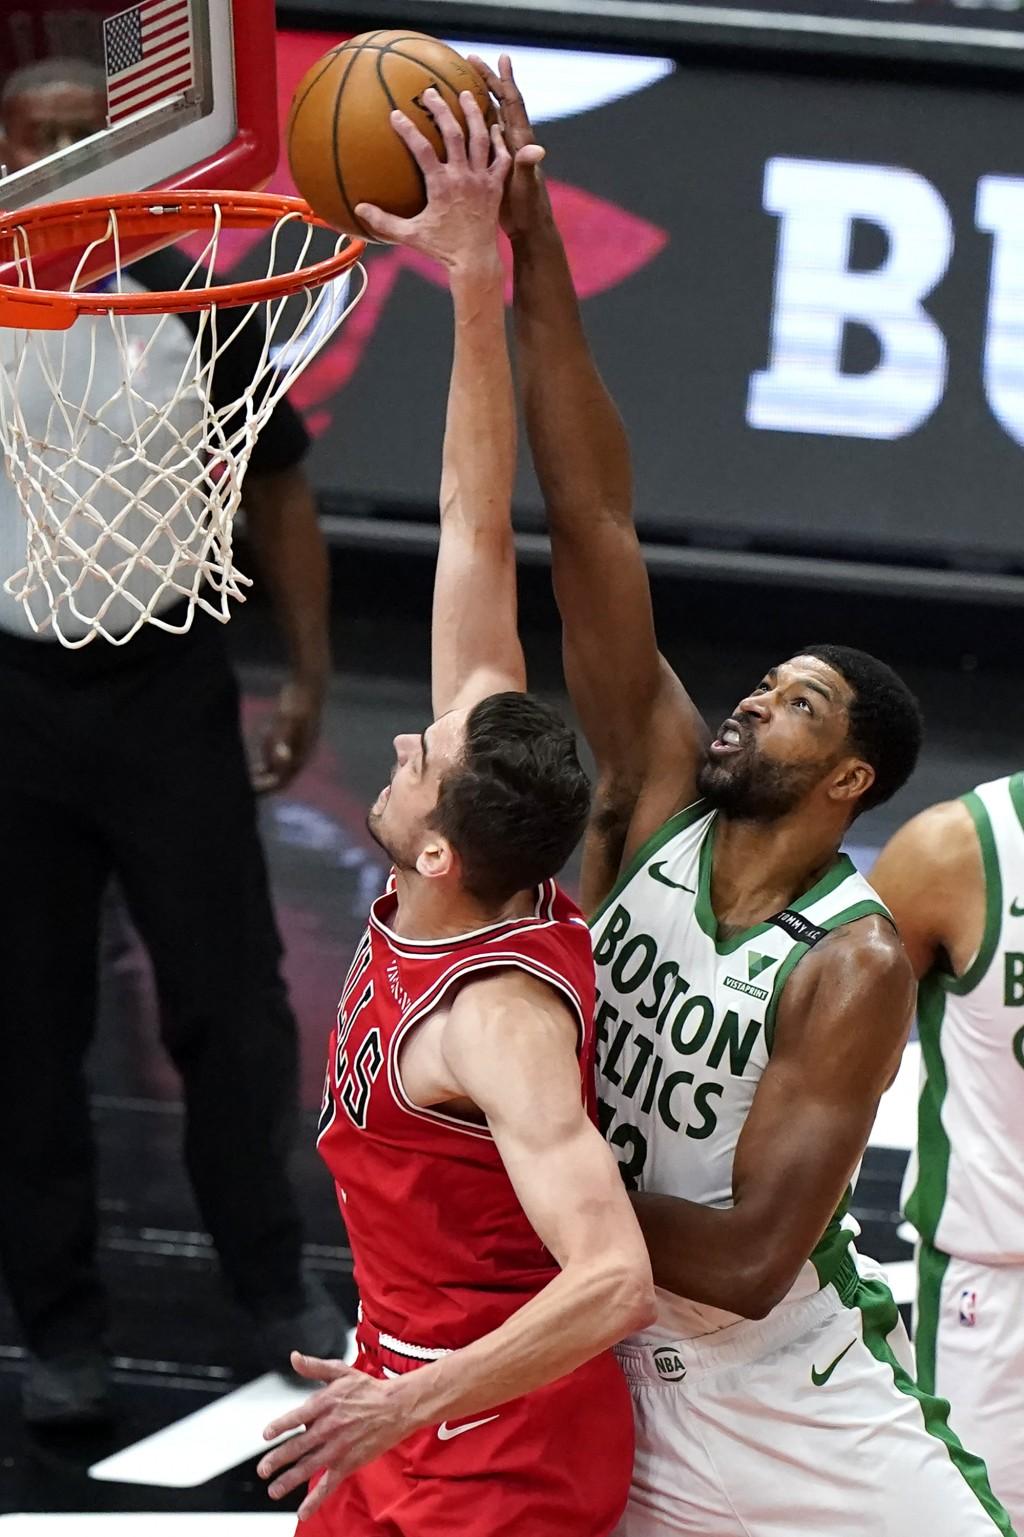 Boston Celtics center Tristan Thompson, right, blocks a shot by Chicago Bulls guard Tomas Satoransky during the first half of an NBA basketball game i...